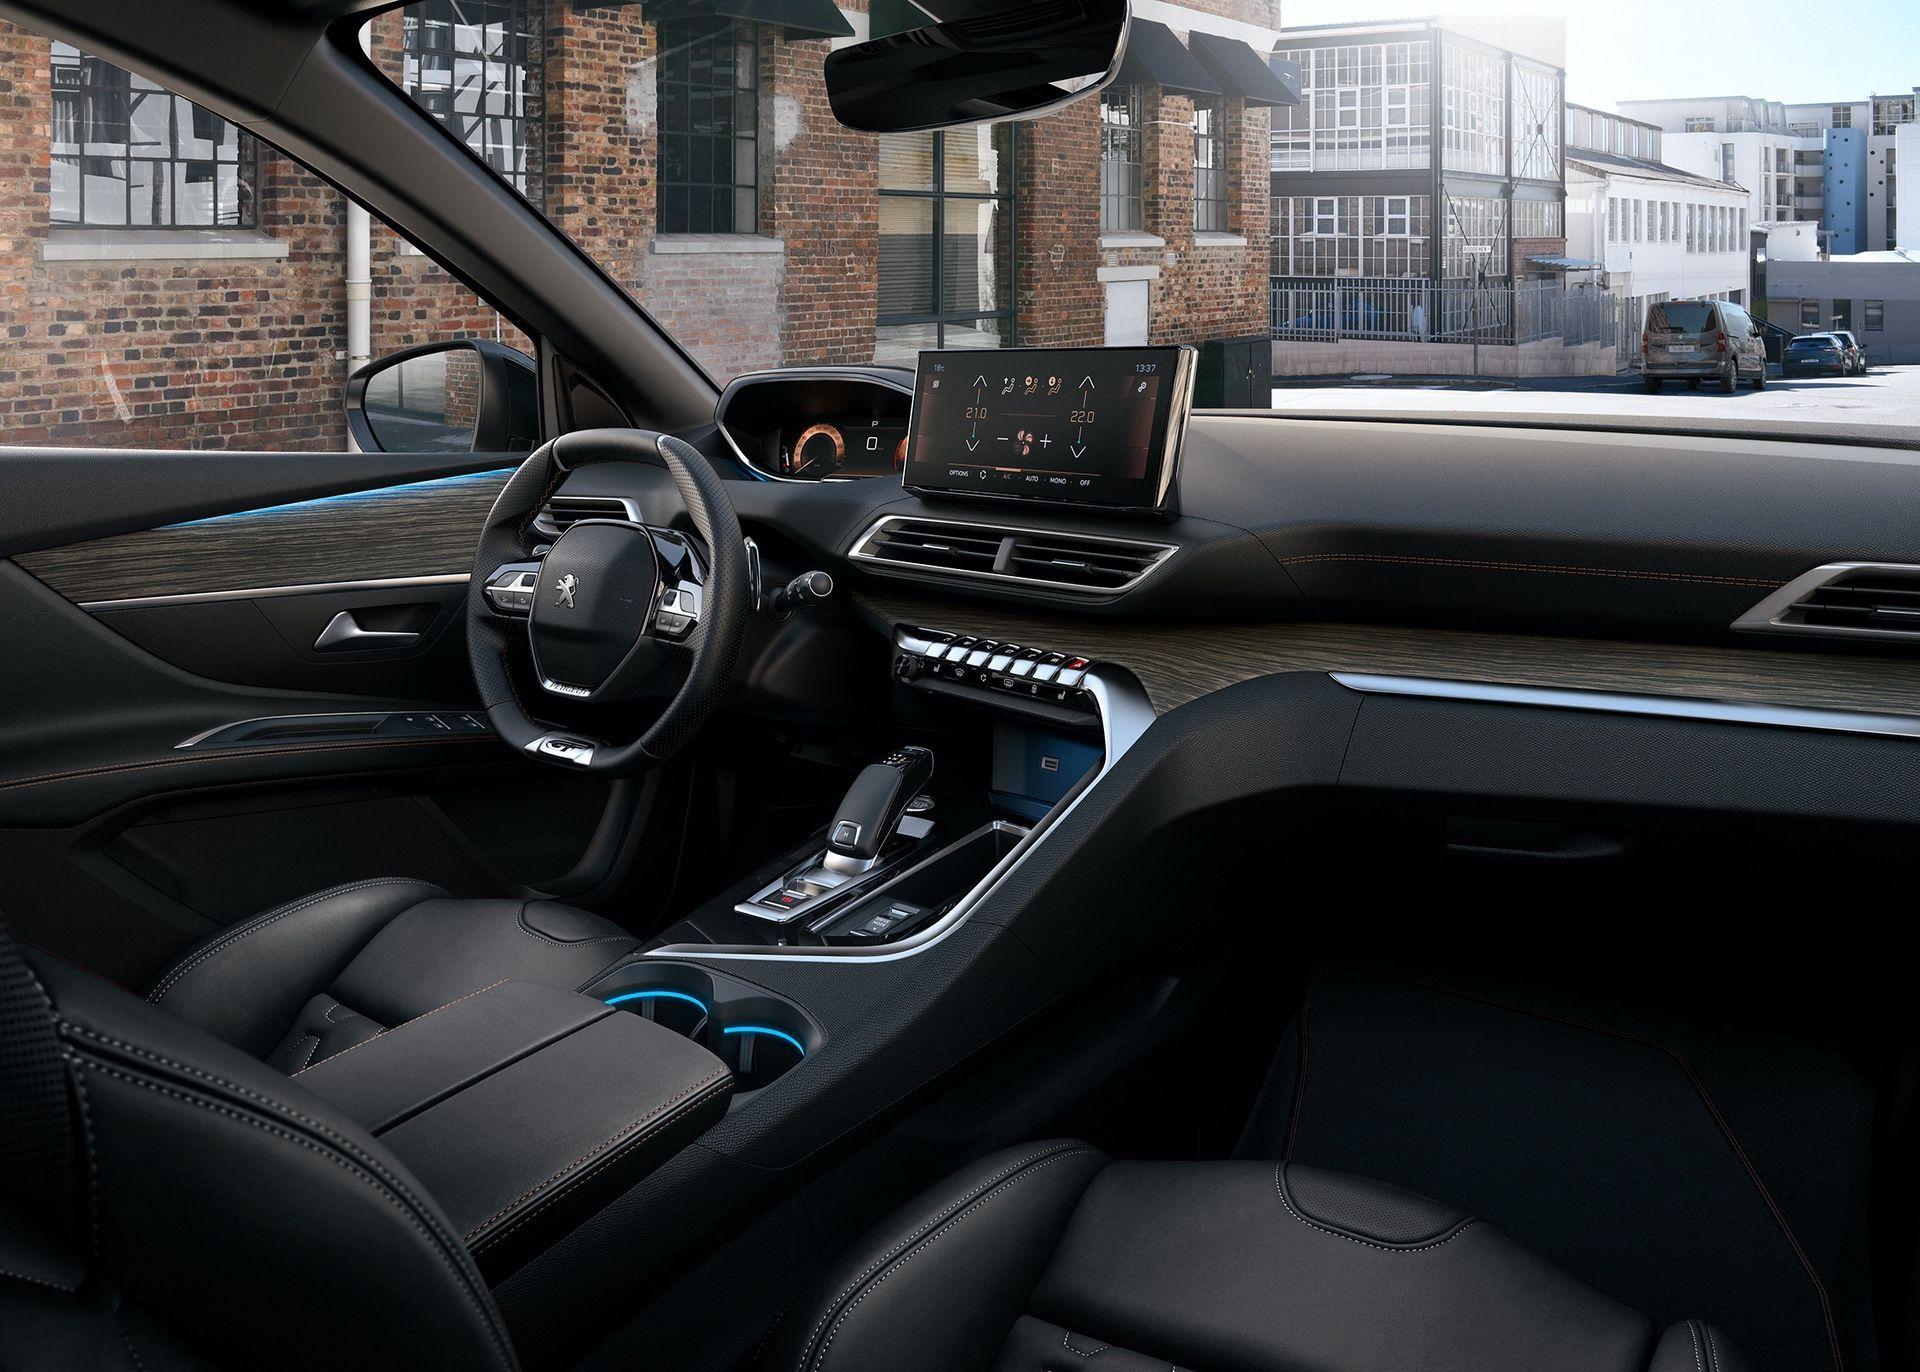 Peugeot_5008_facelift_0011